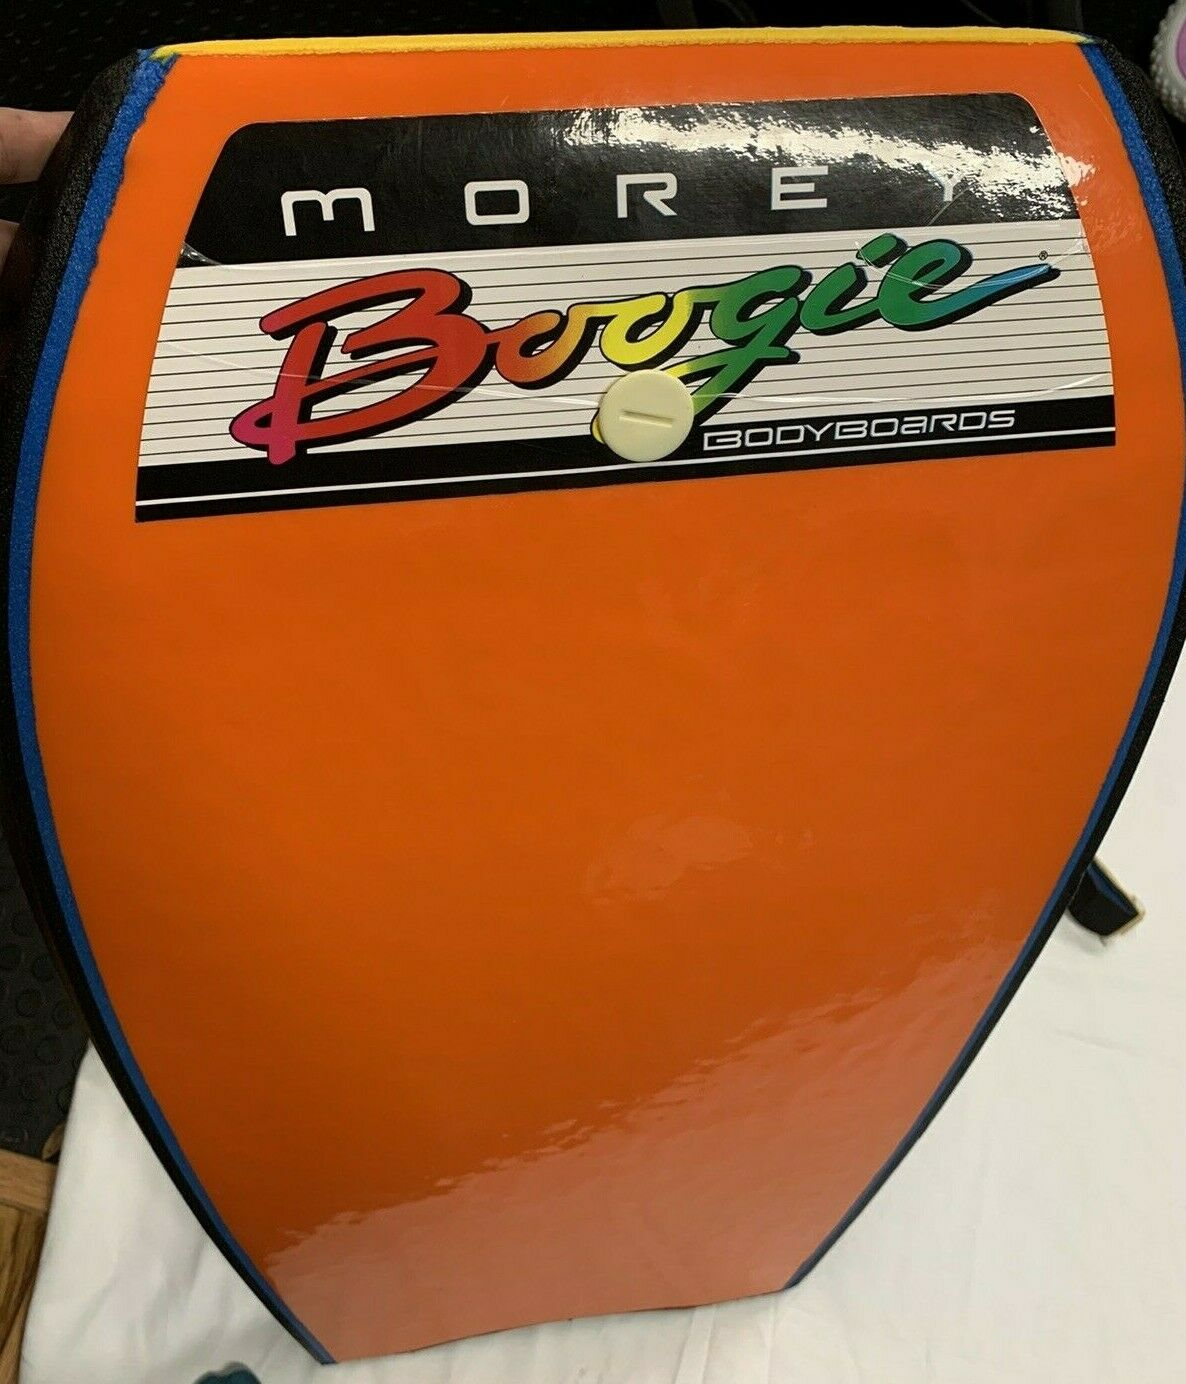 Vintage Morey Boogie Board Mach 7-SS Bodyboard Rare Turbo Le